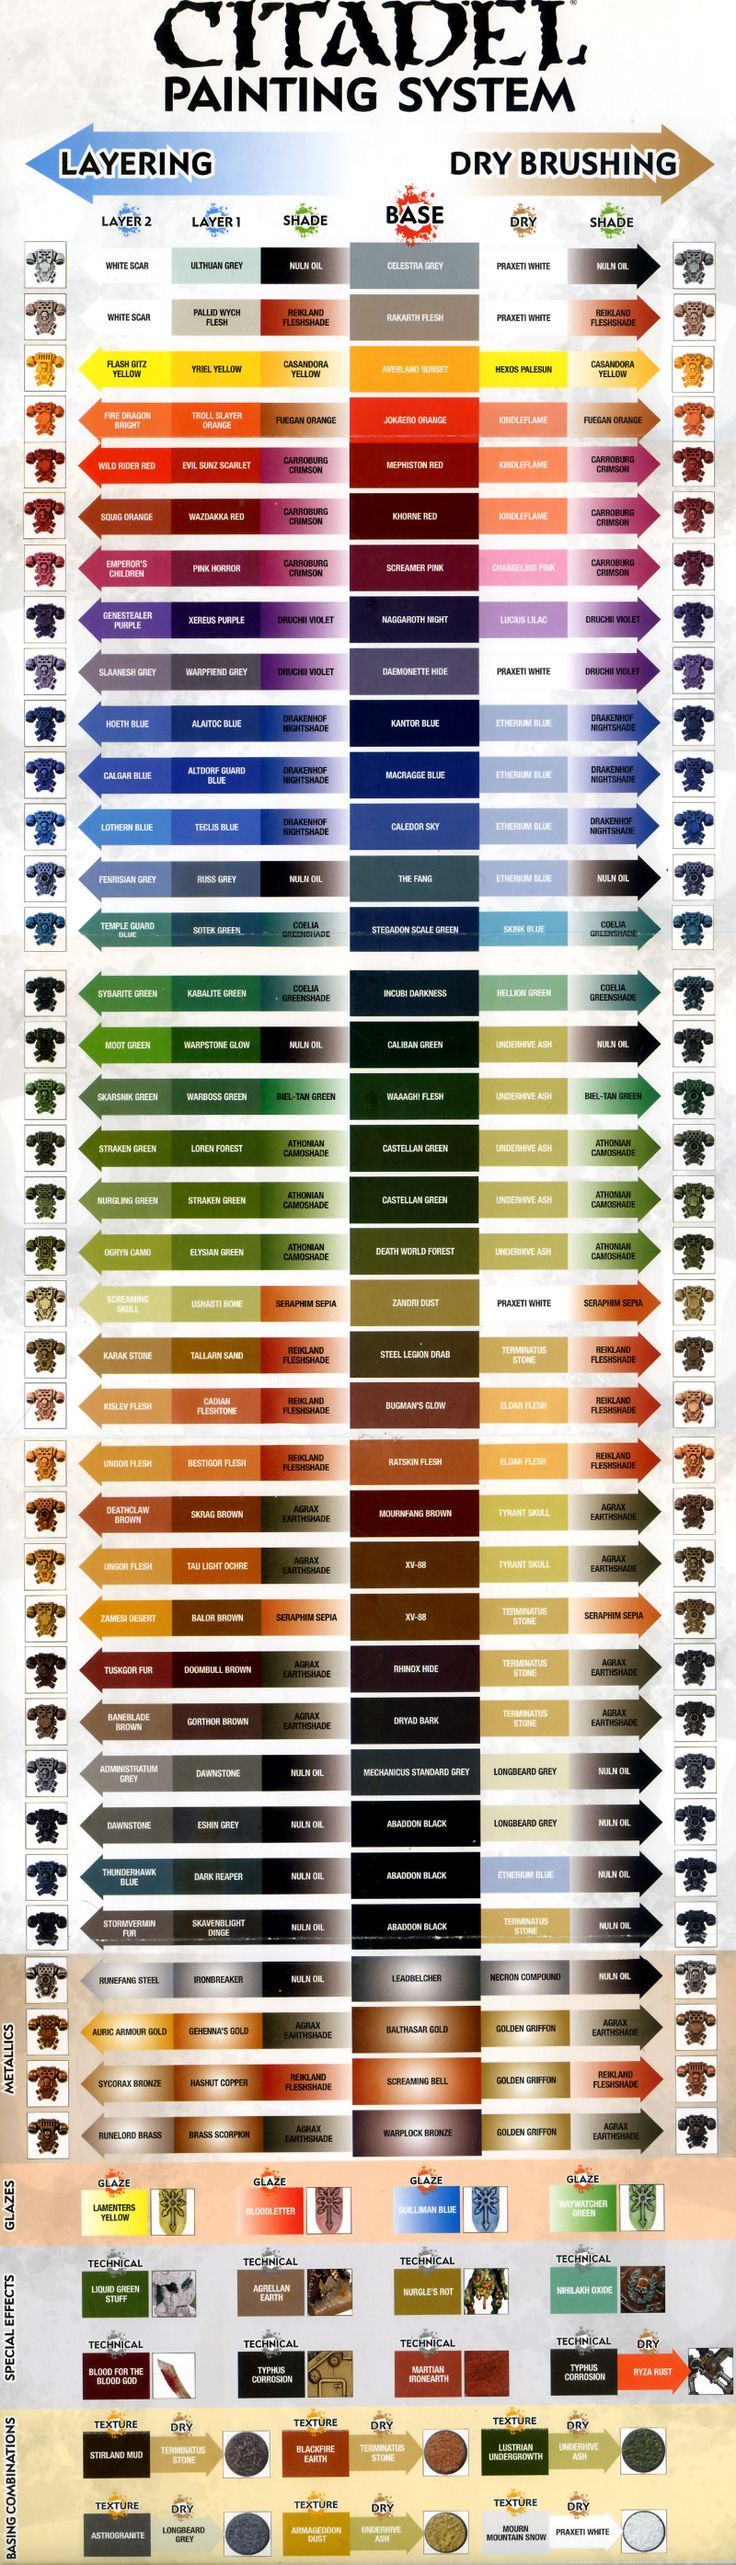 Tutorial: Painting Guide, Citadel Painting Chart Full